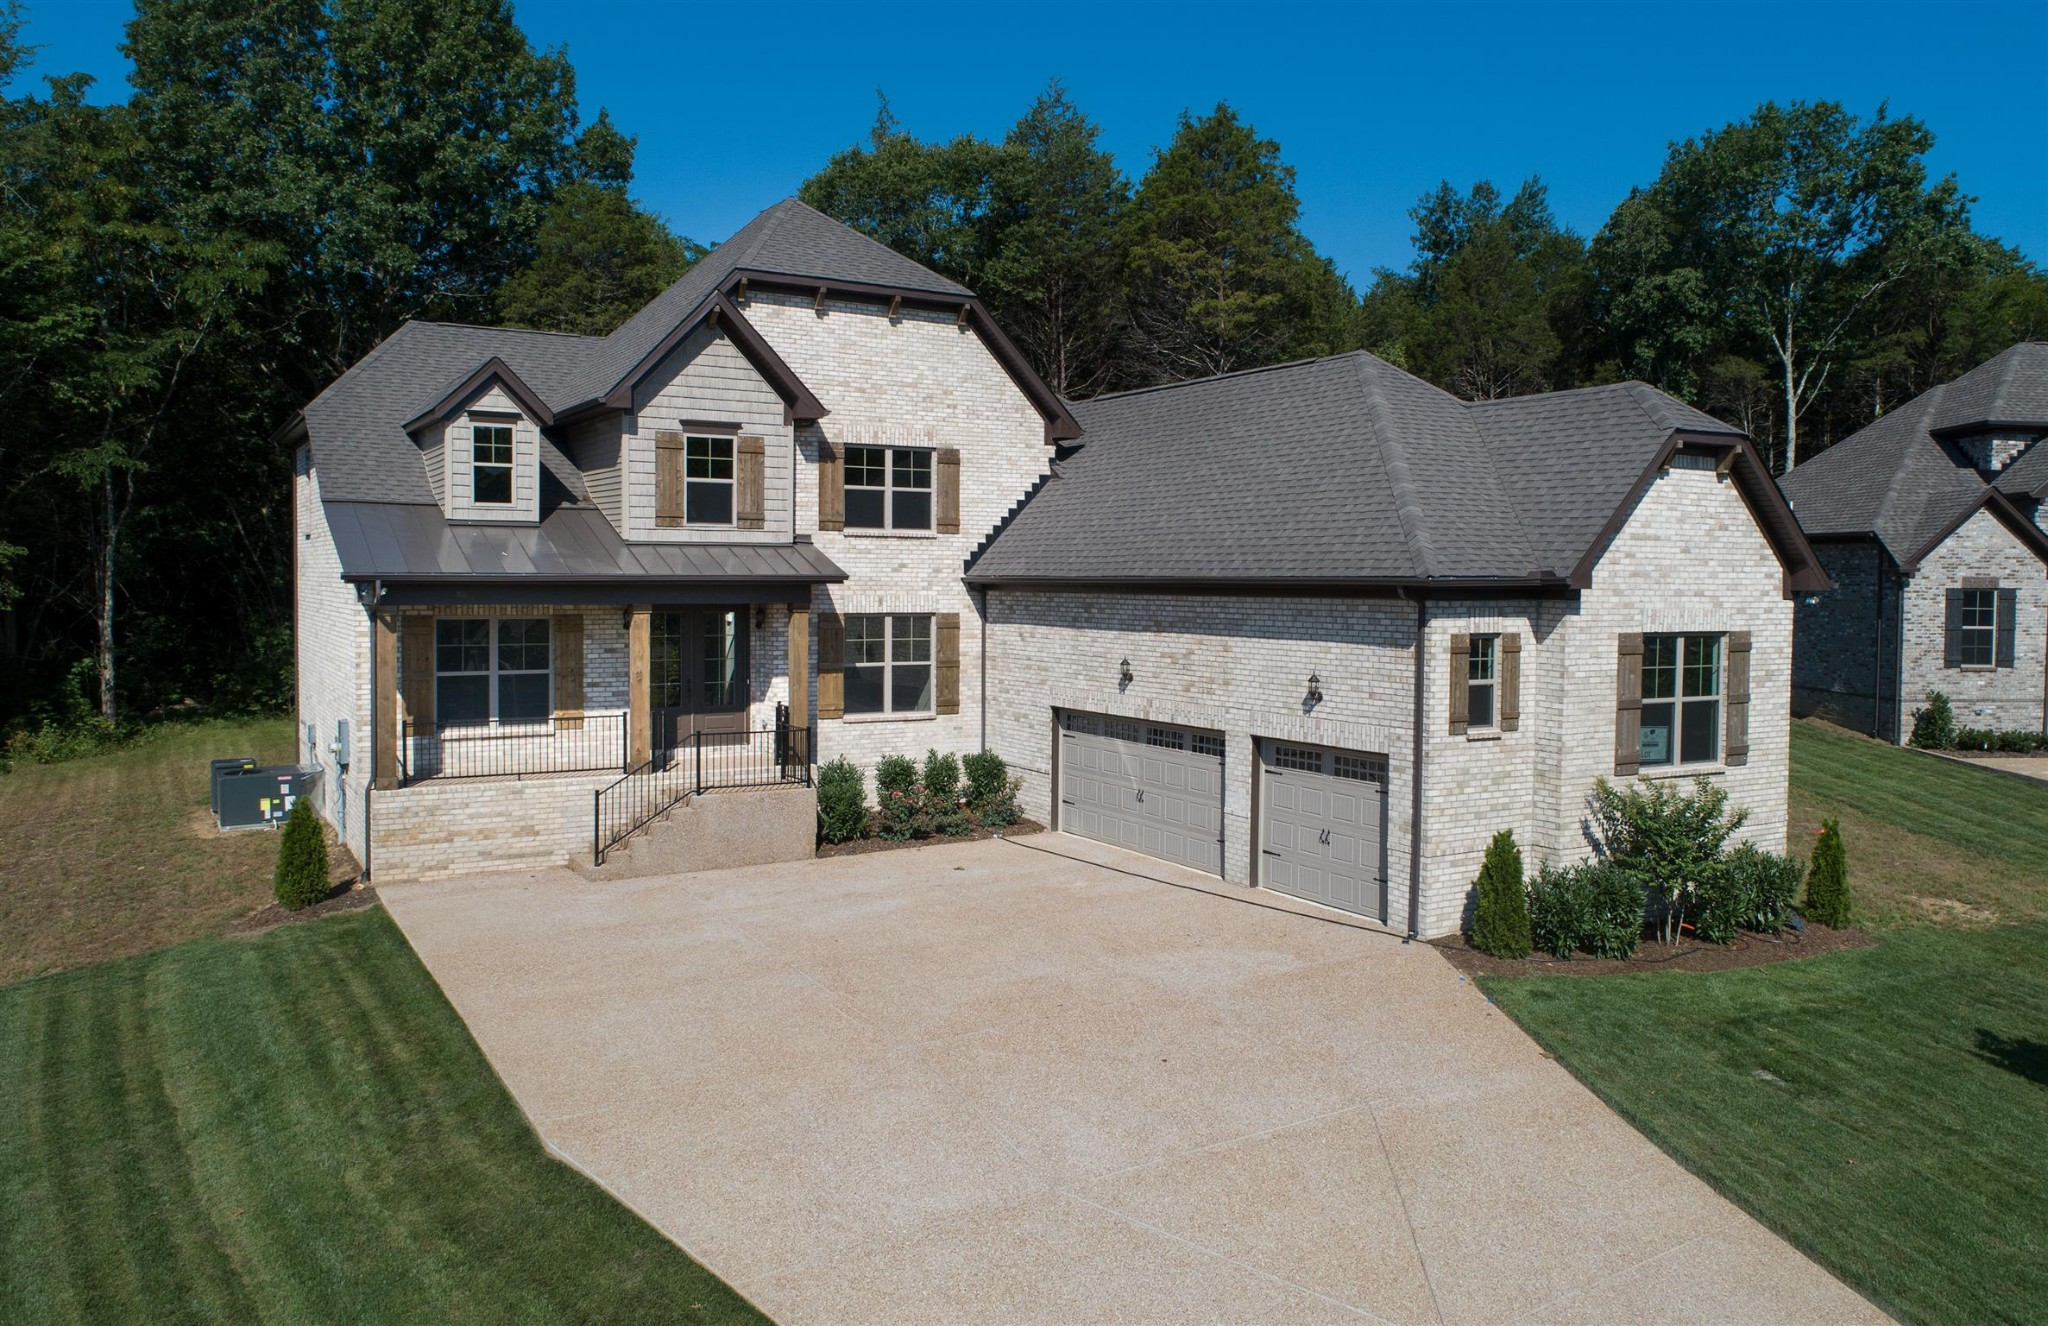 113 Watermill Lane Lot 123, Lebanon, TN 37087 - Lebanon, TN real estate listing